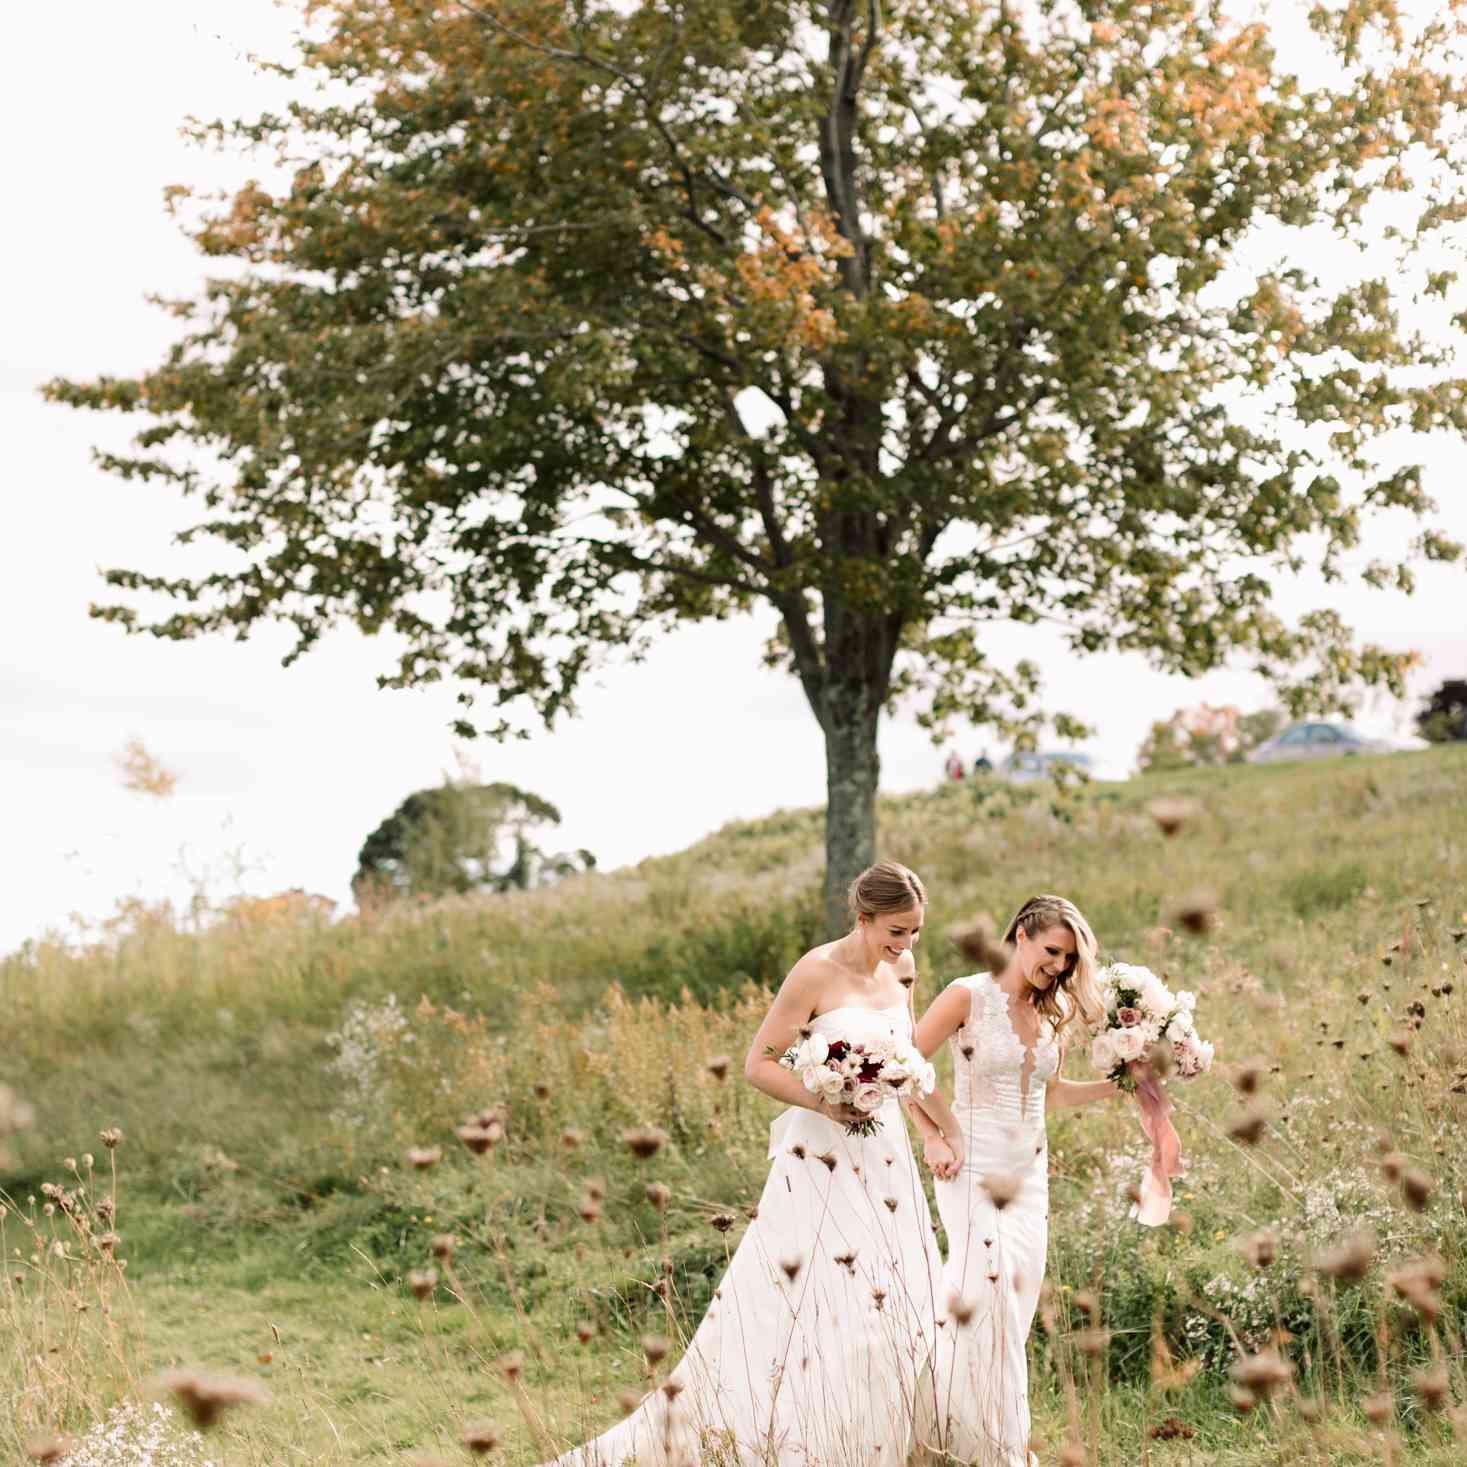 brides in a field